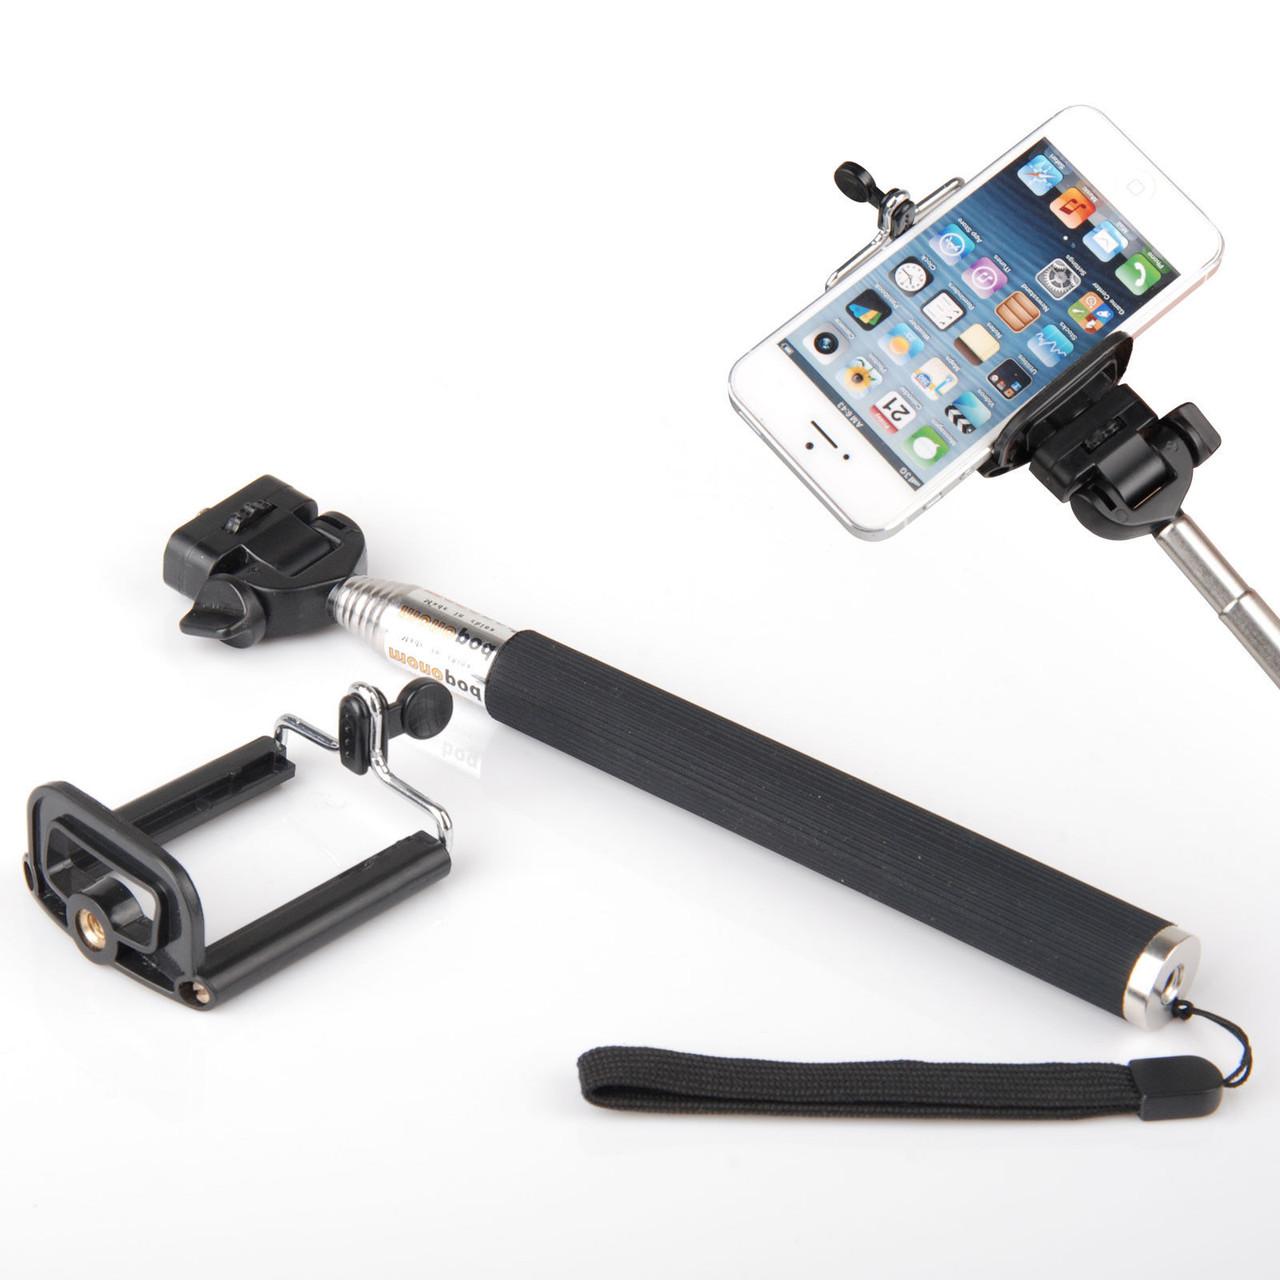 Монопод для селфи (смартфон крепление + Bluetooth пульт) Z07-1 (3in1)